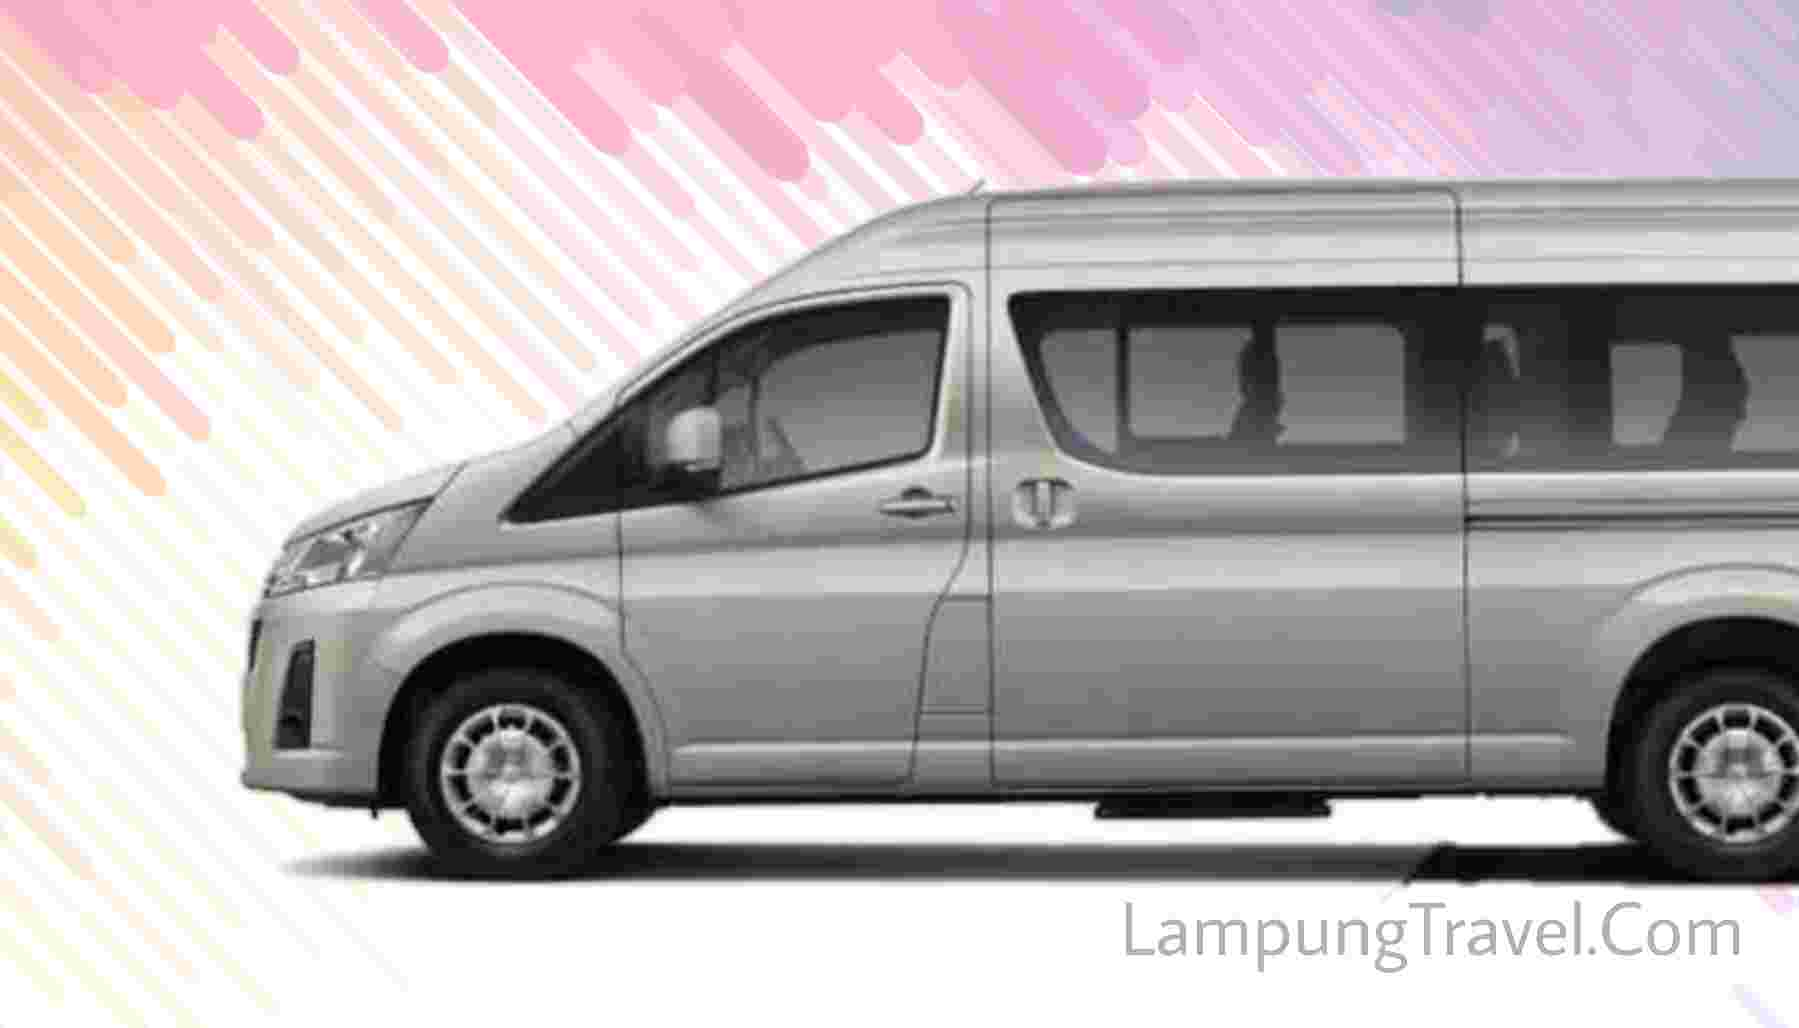 Agen Travel Jati Waringin Pringsewu Metro Lampung